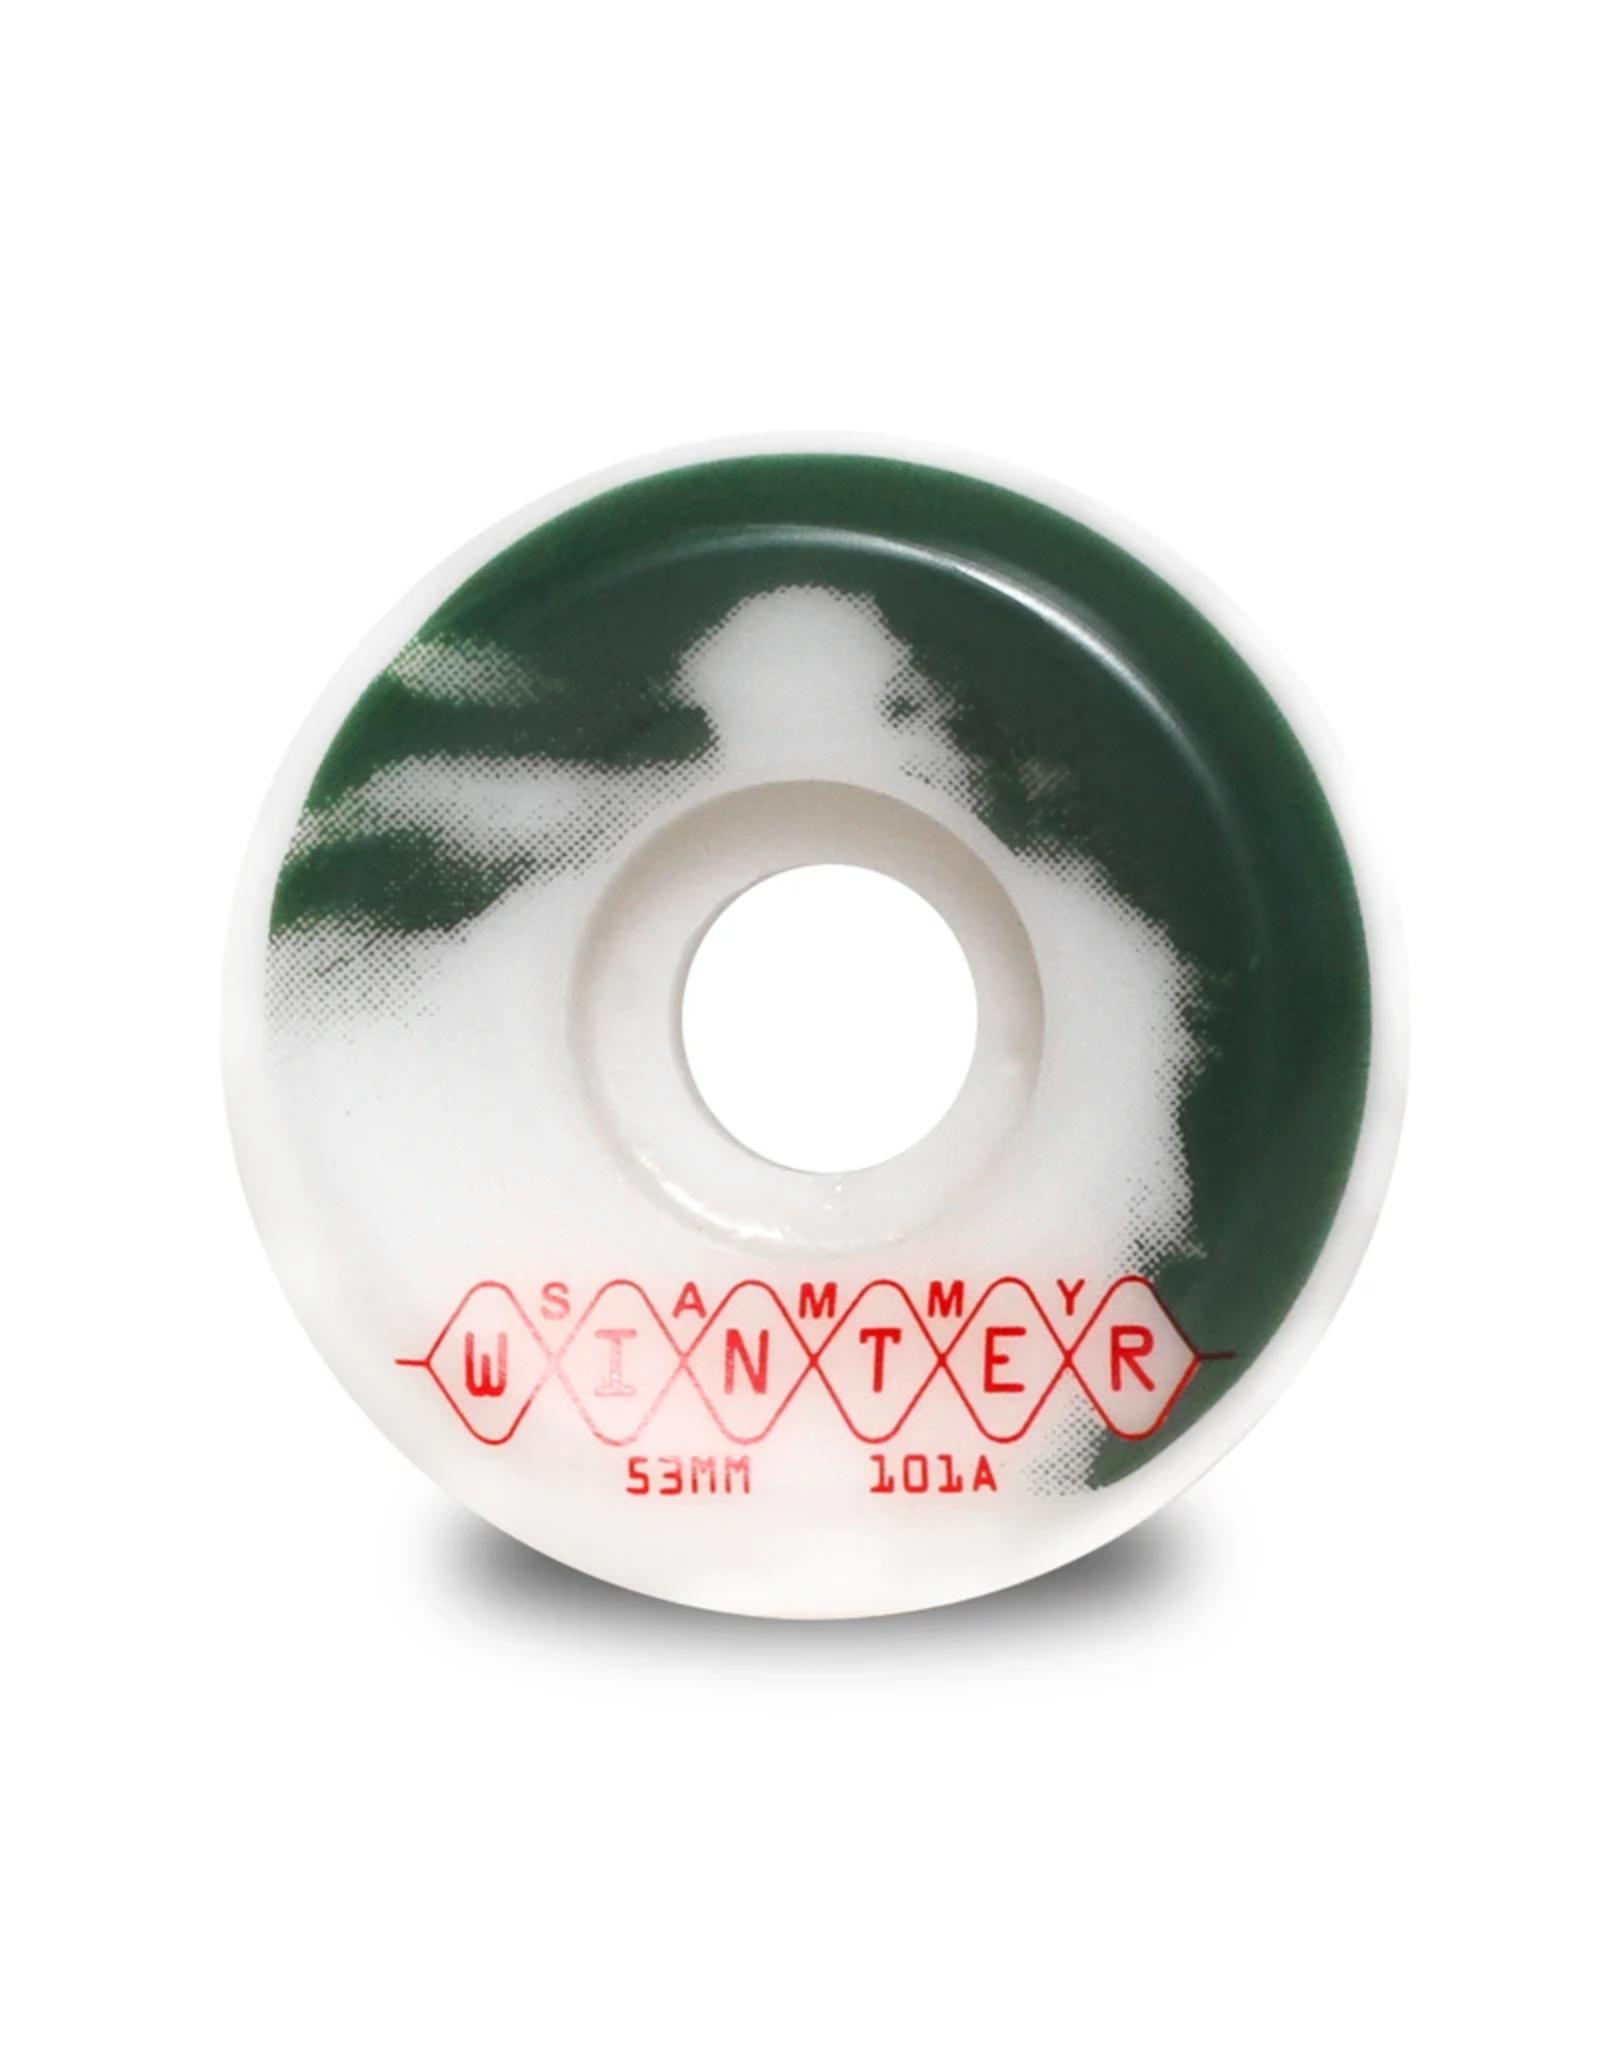 Wayward Wheels Wayward - Funnel Cut 101a - Sammy Winter PRO 53mm